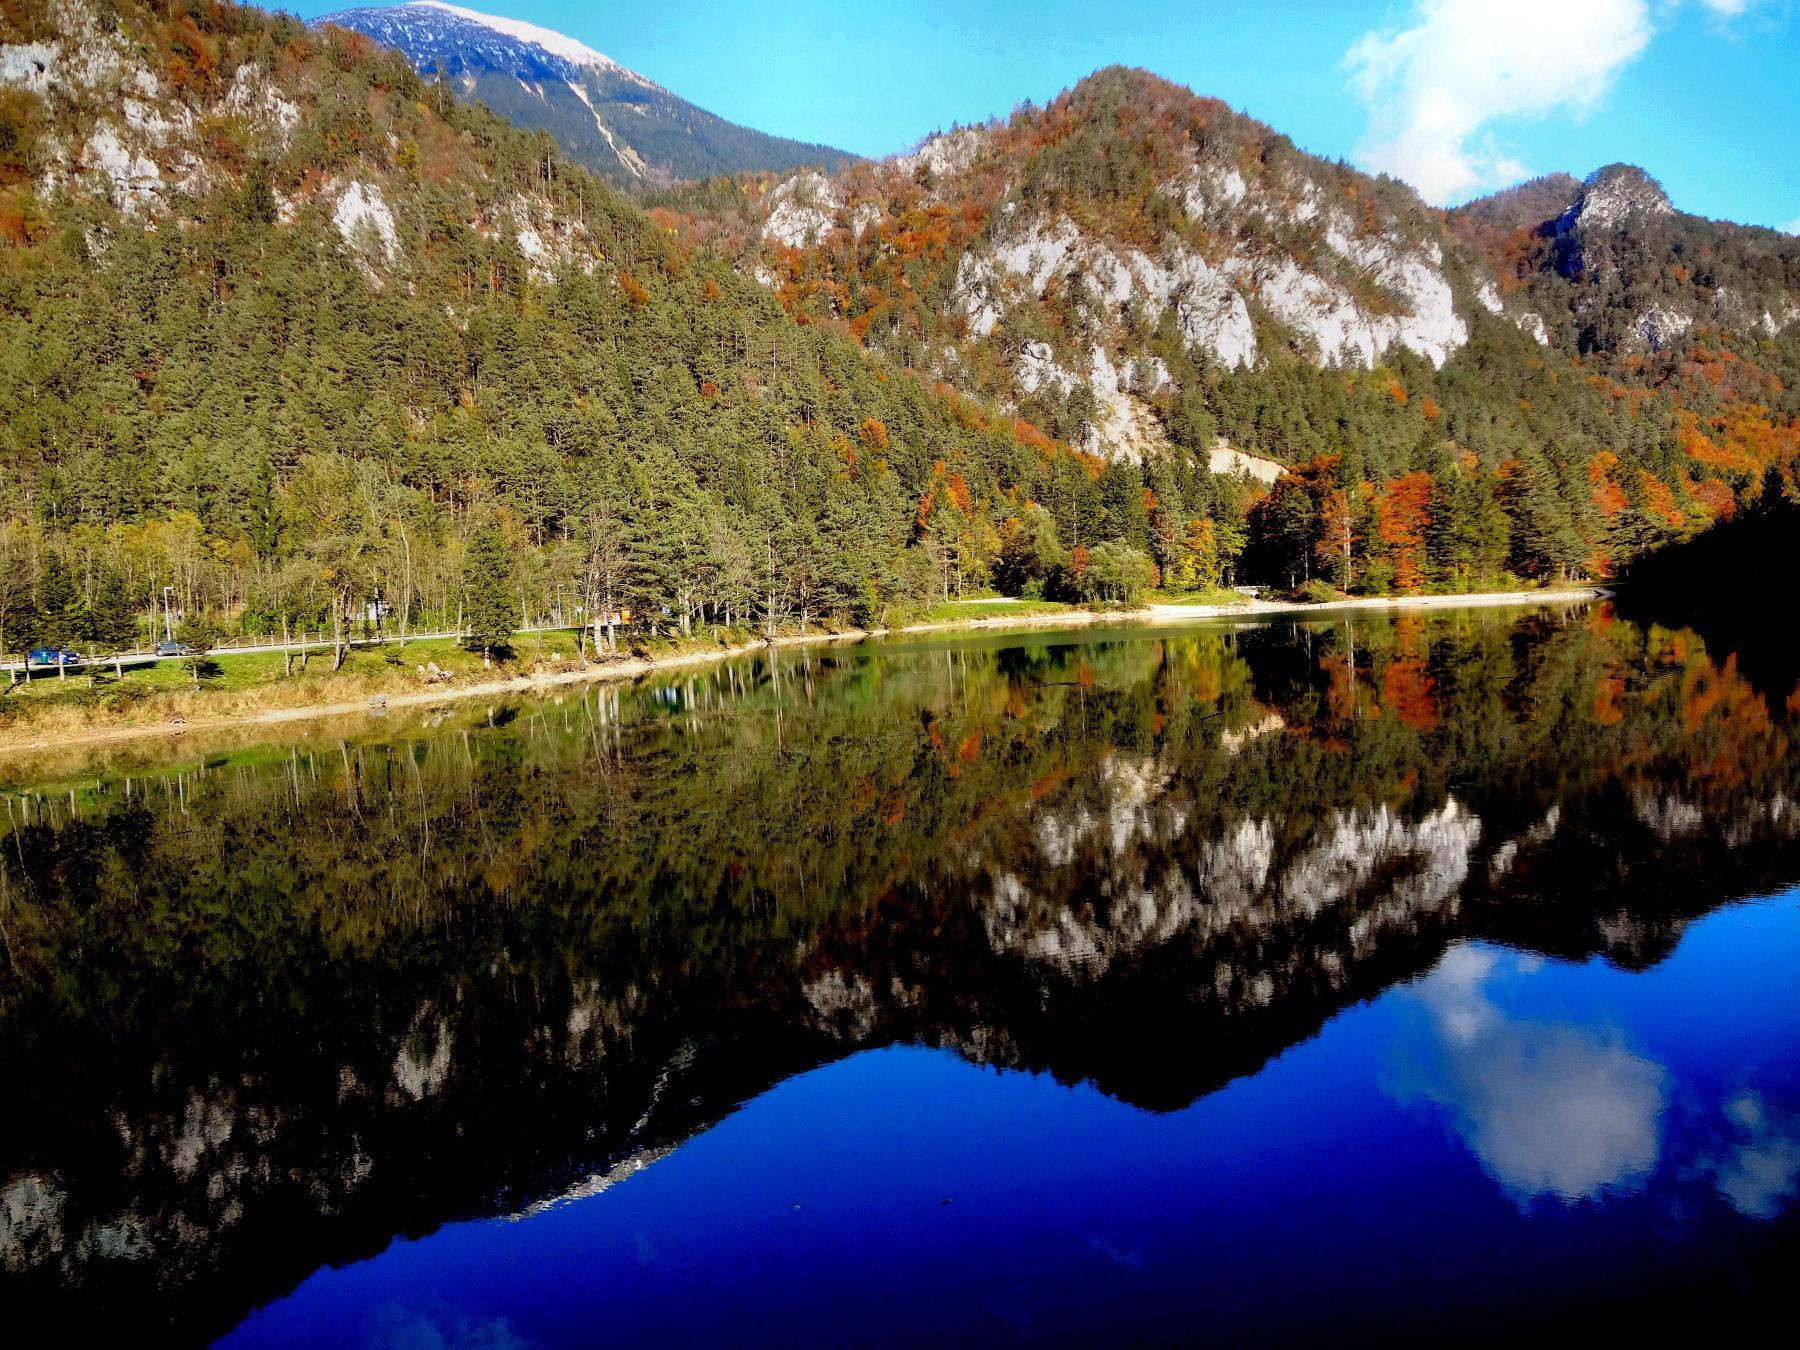 autumn-nature-slovenia-046